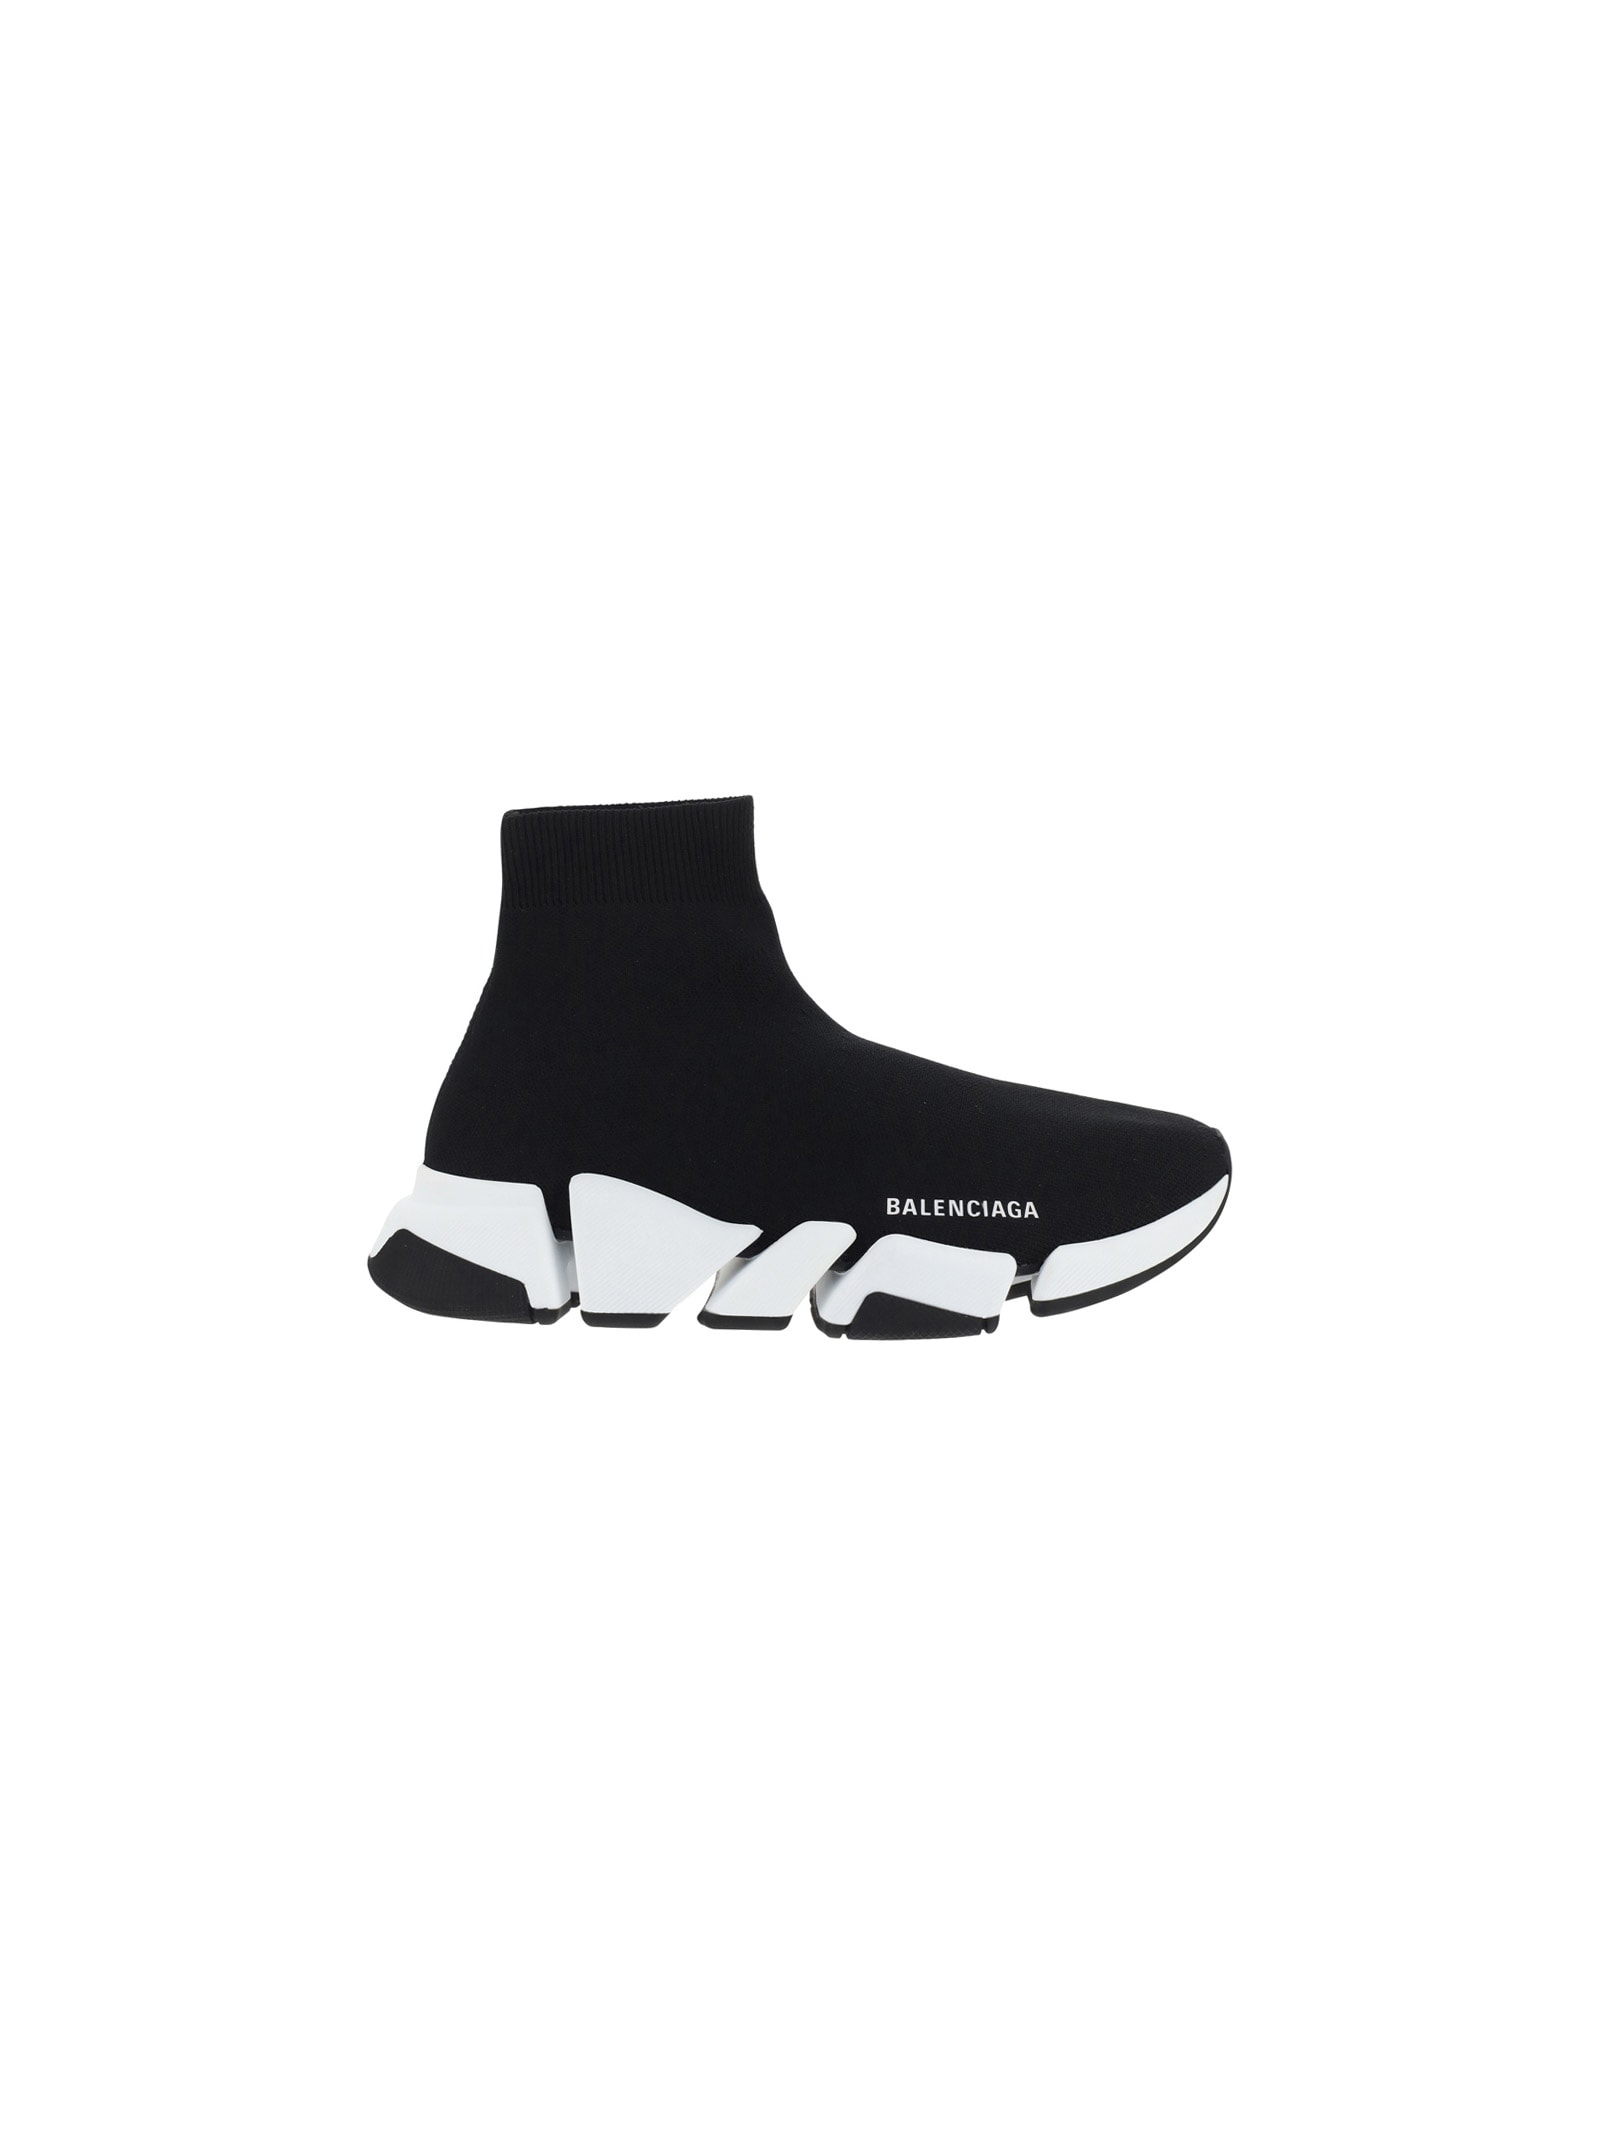 Balenciaga Sneakers SPEED SNEAKERS